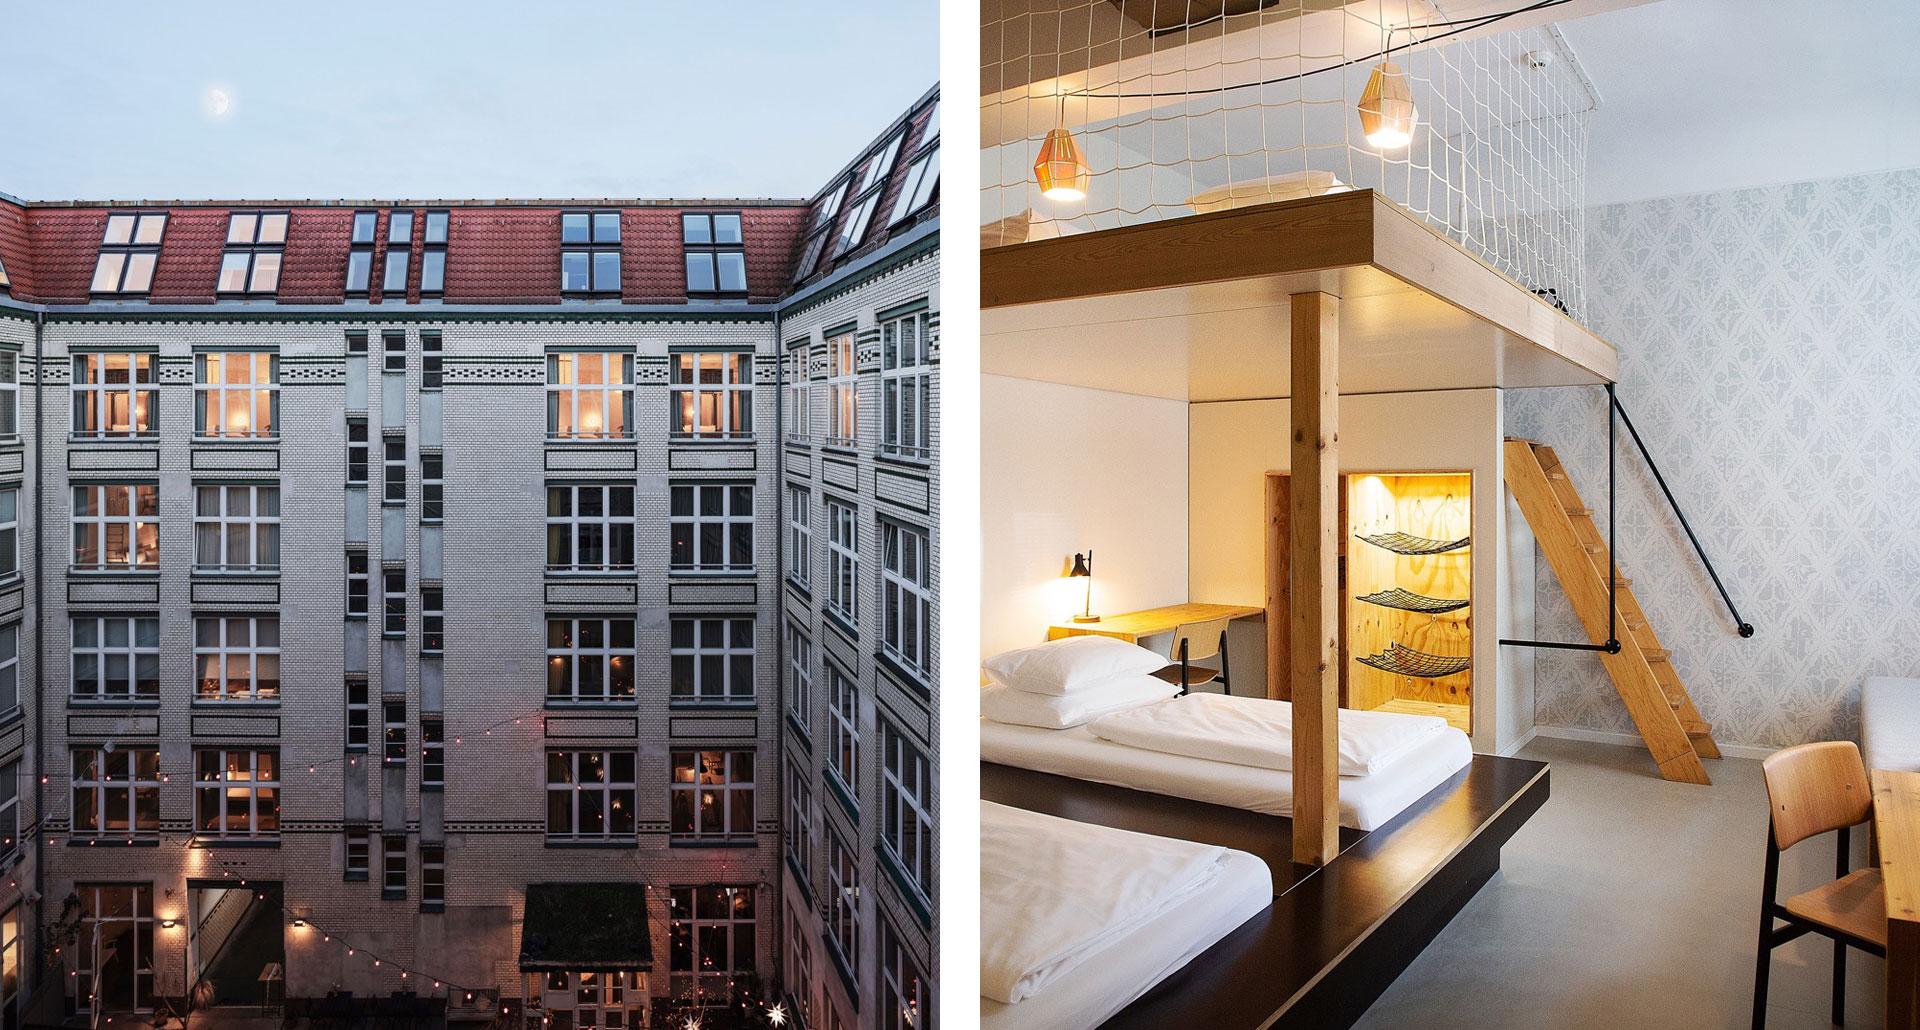 Michelberger Hotel - boutique hotel in Berlino